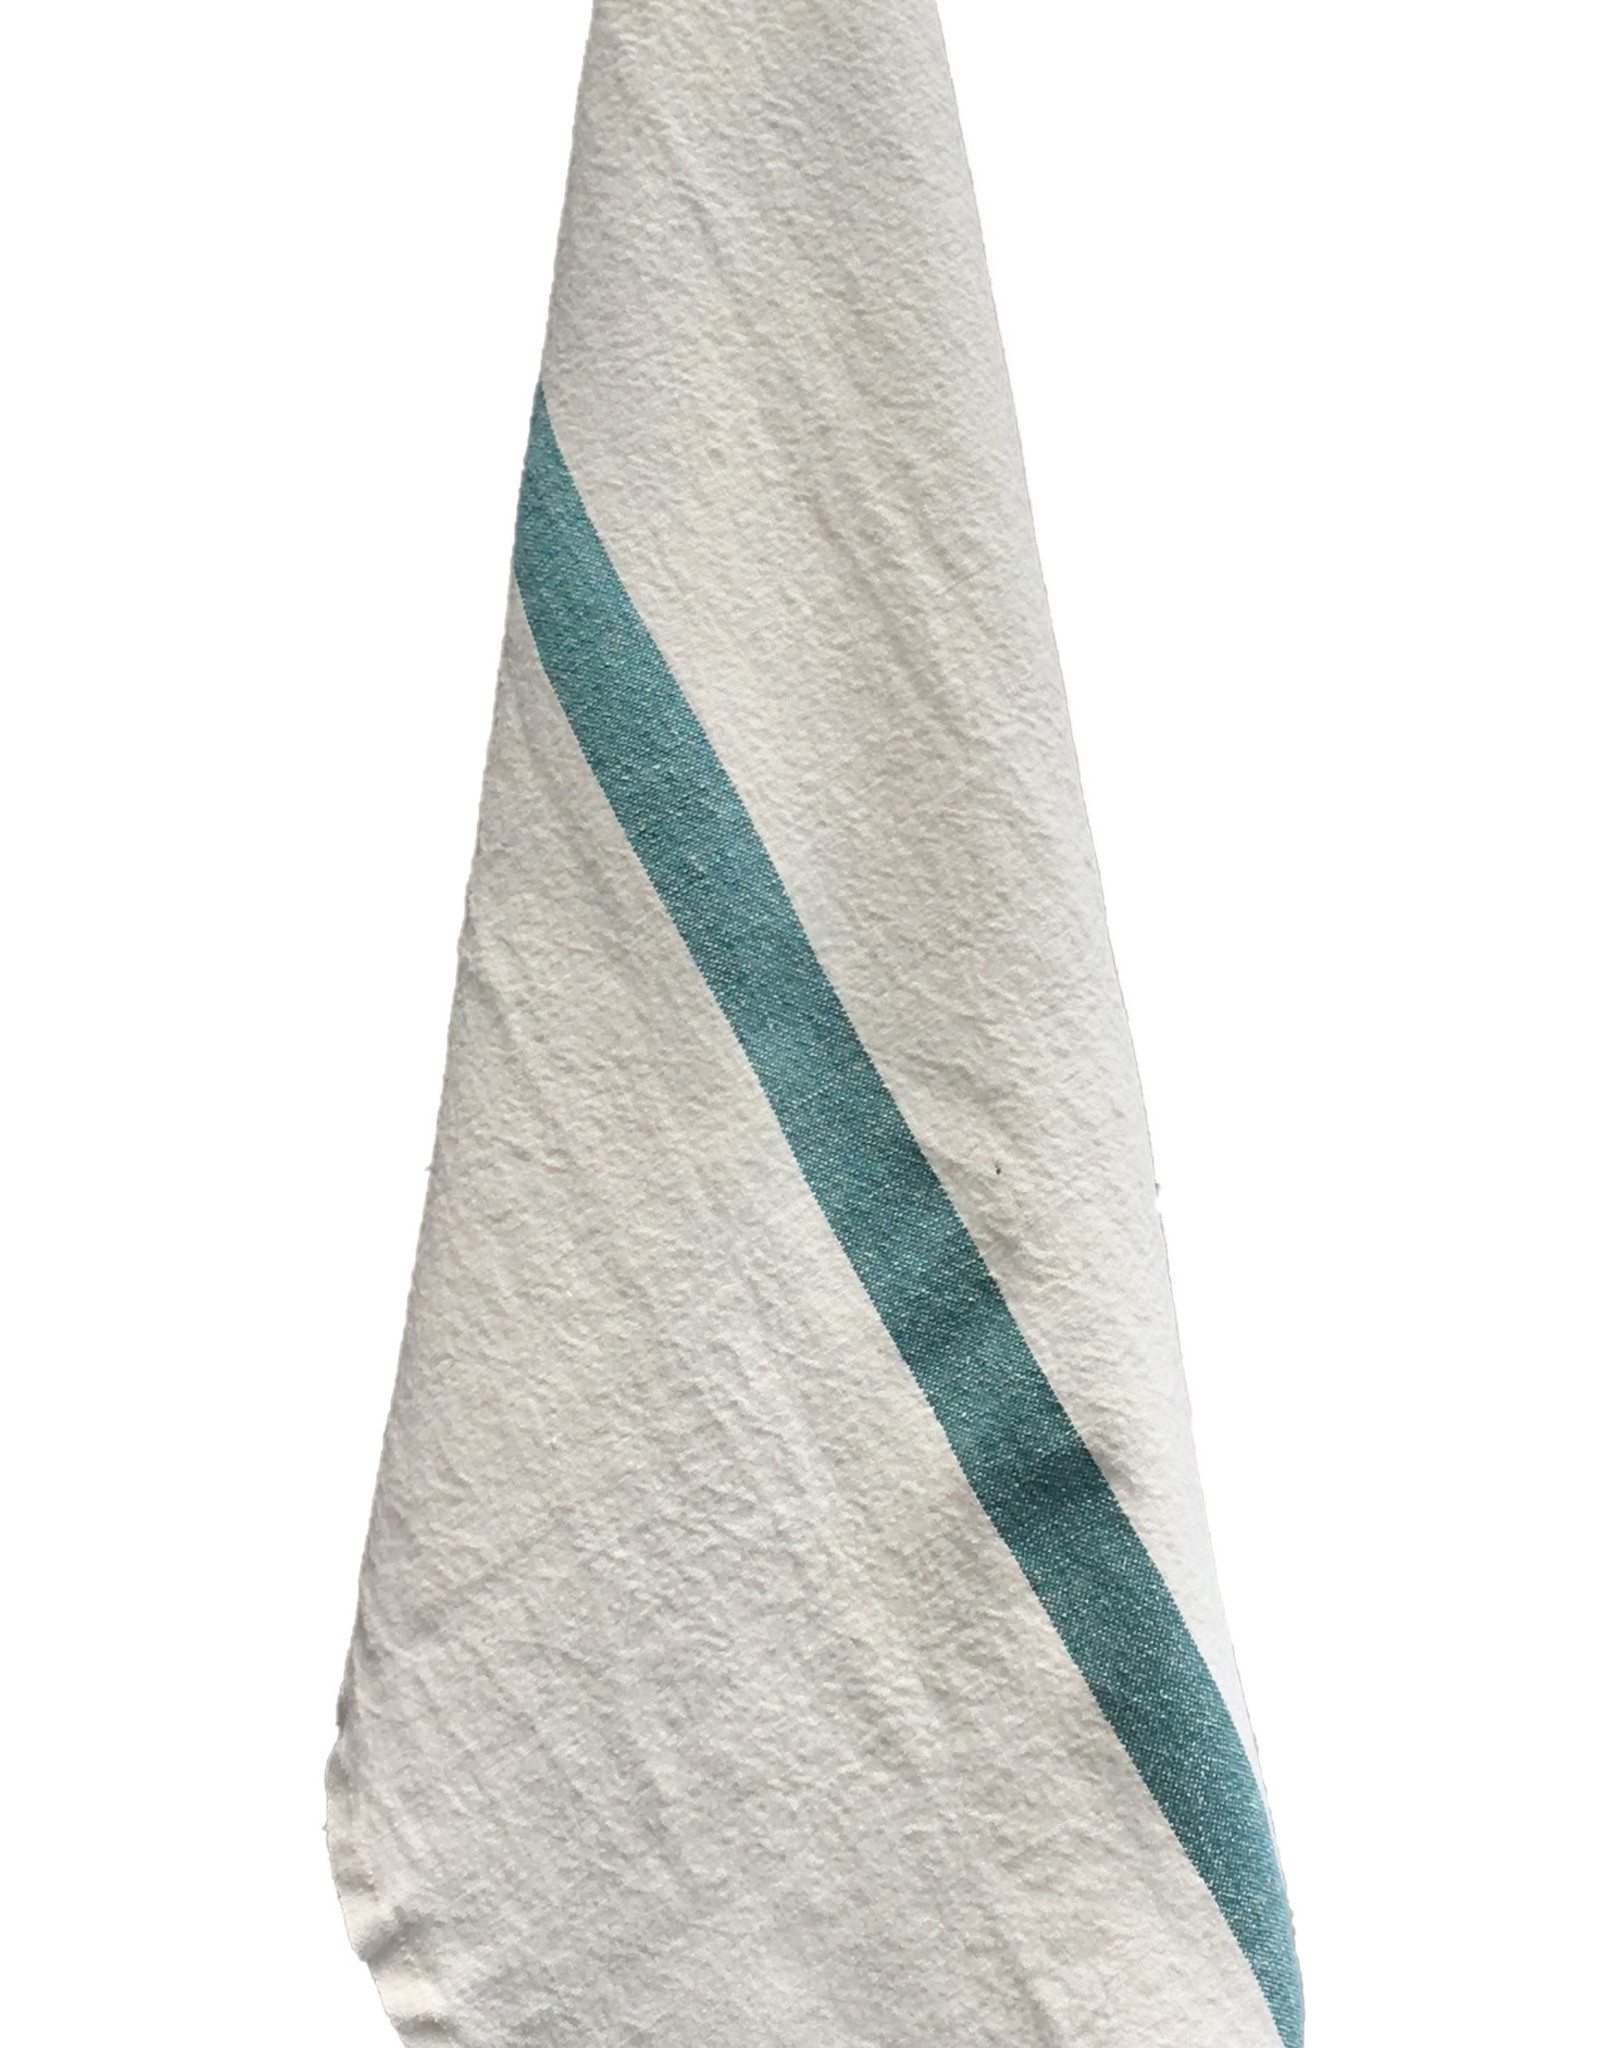 "Charvet Editions - Bistro Towel DouDou White/Aqua - 18"" x 30"""